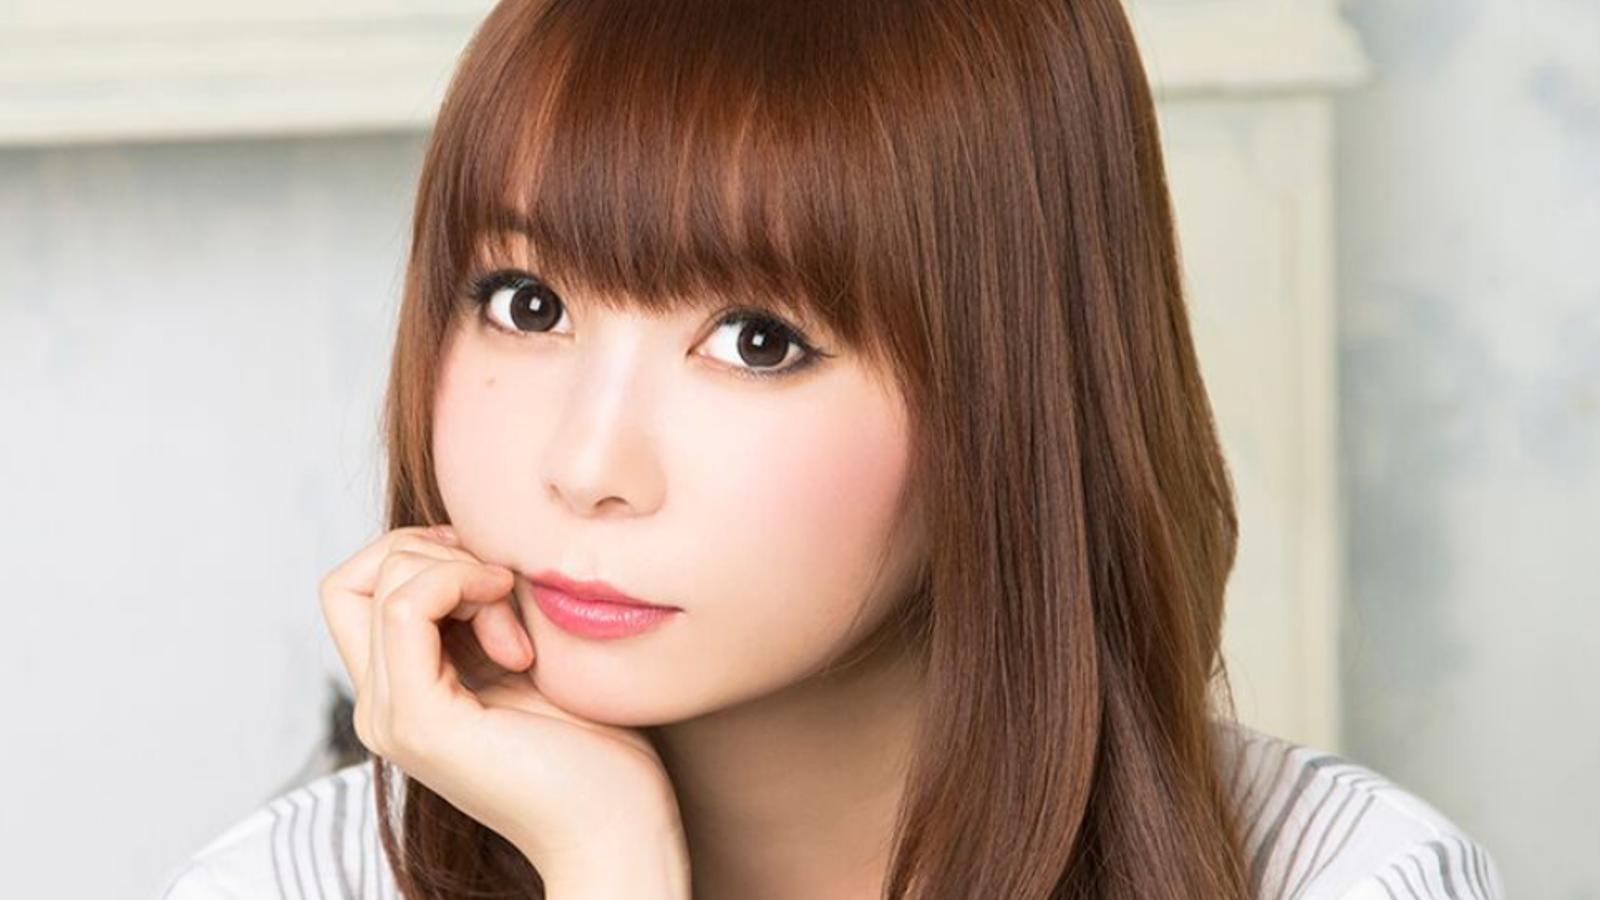 Being An Otaku Has Gotten Easier, Says Shoko Nakagawa